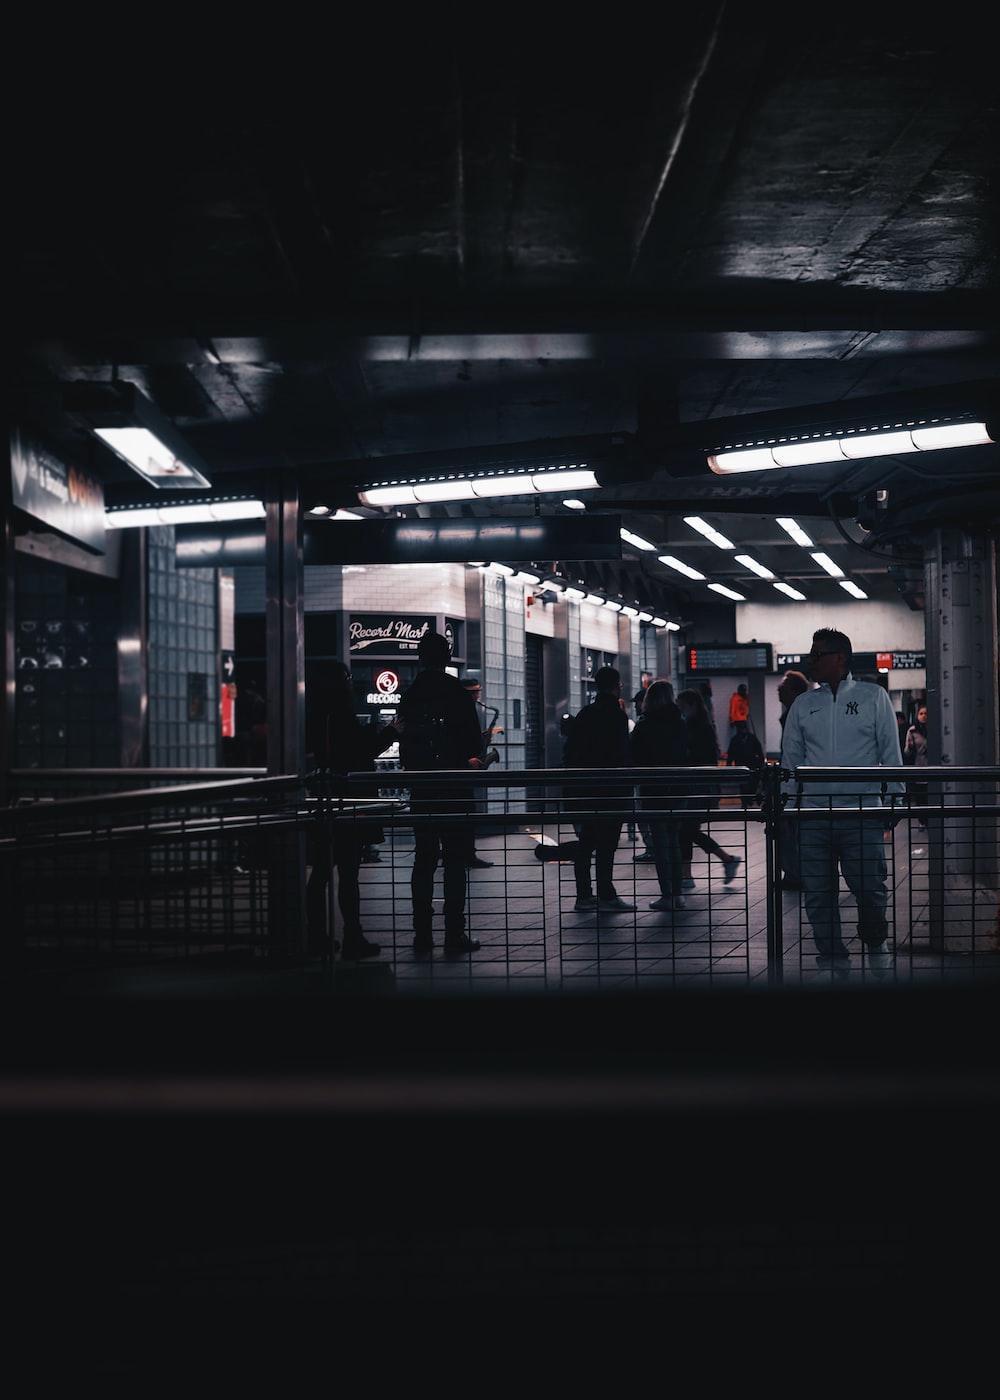 people inside building